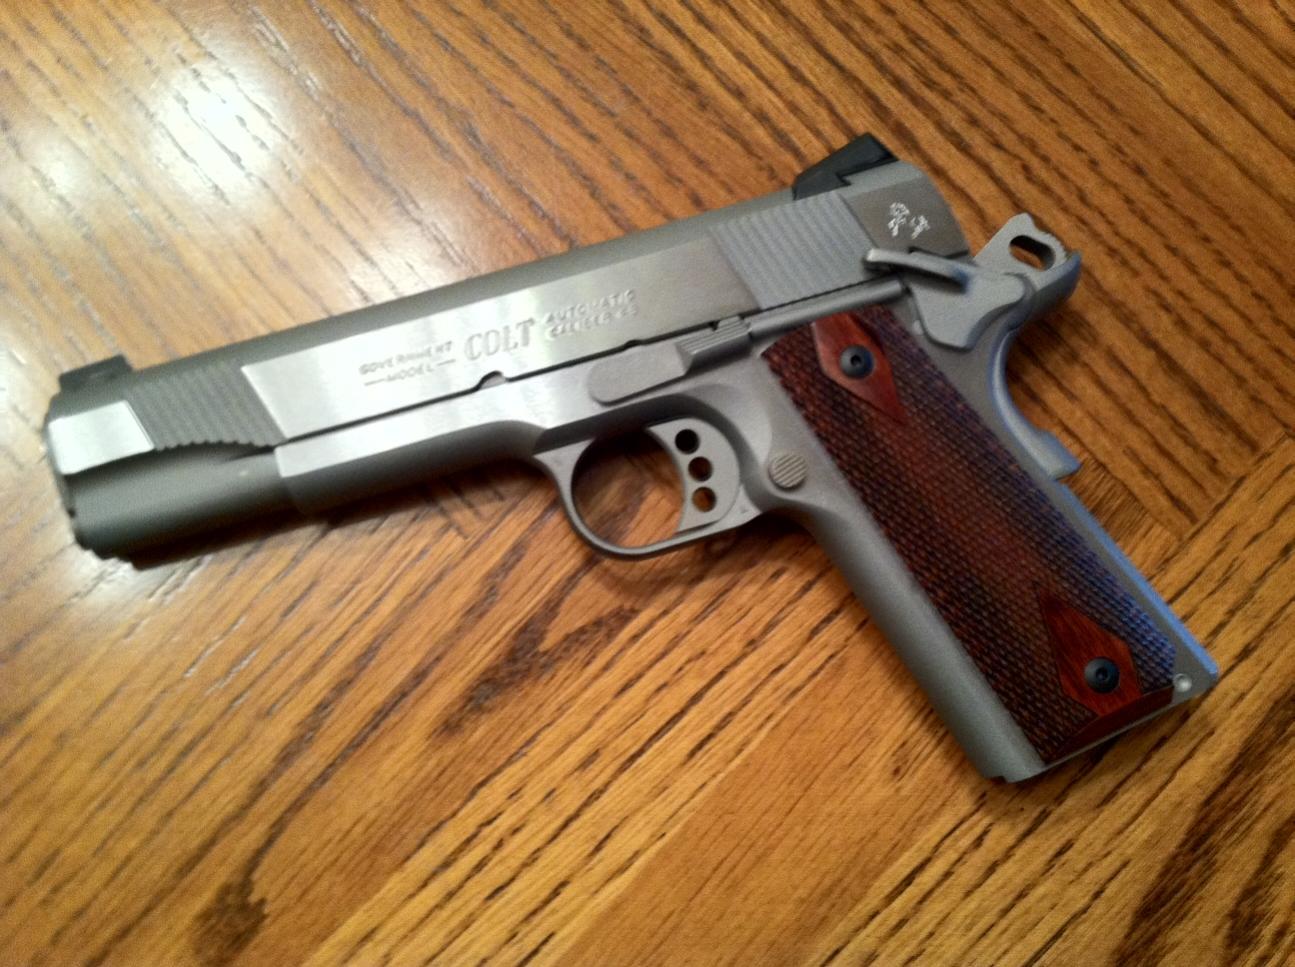 Colt 1911 stainless care-lftcolt.jpg